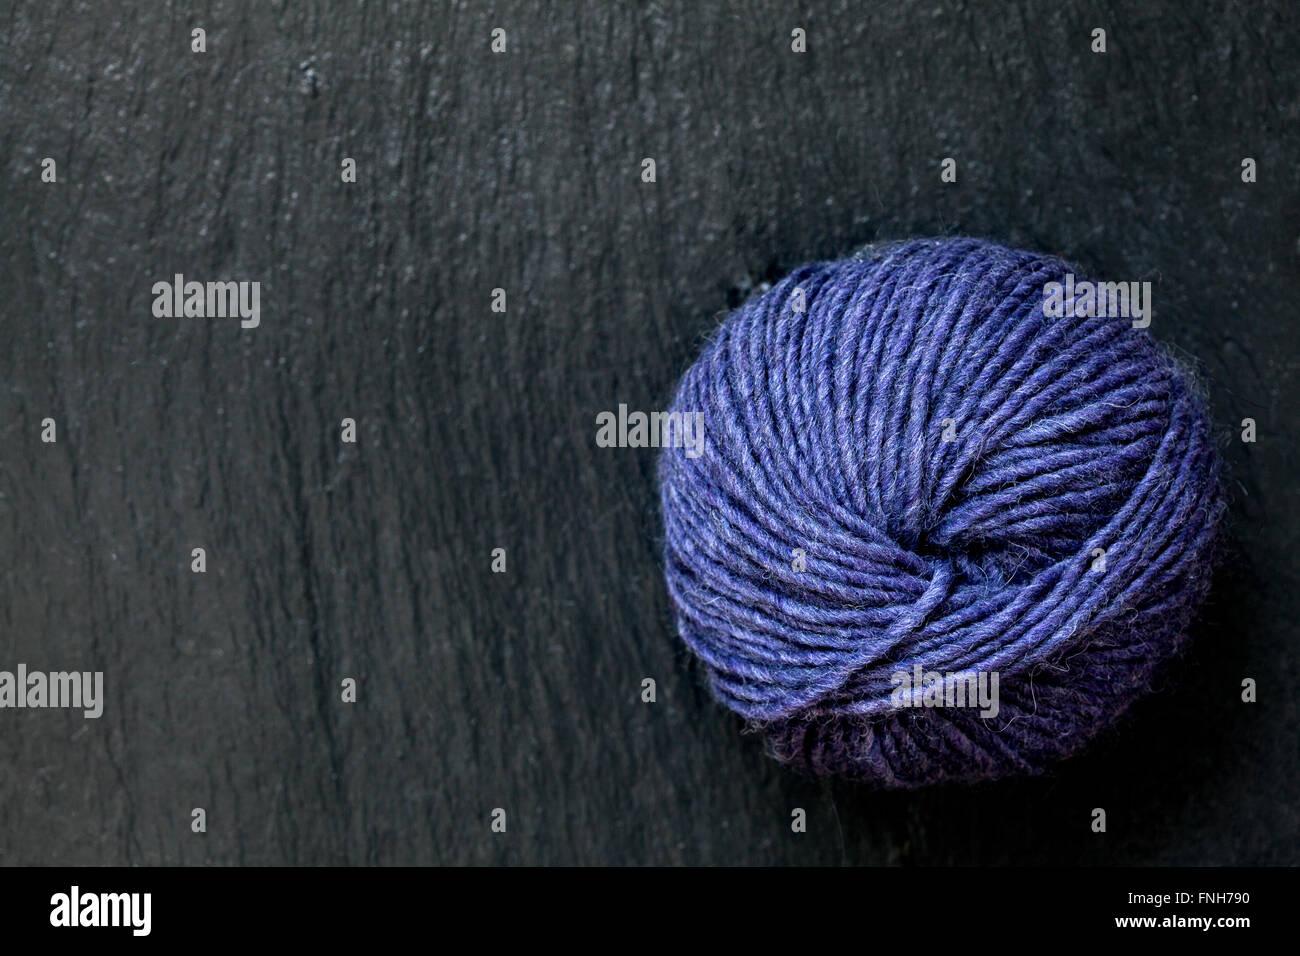 skein of purple yarn with black slate background - Stock Image